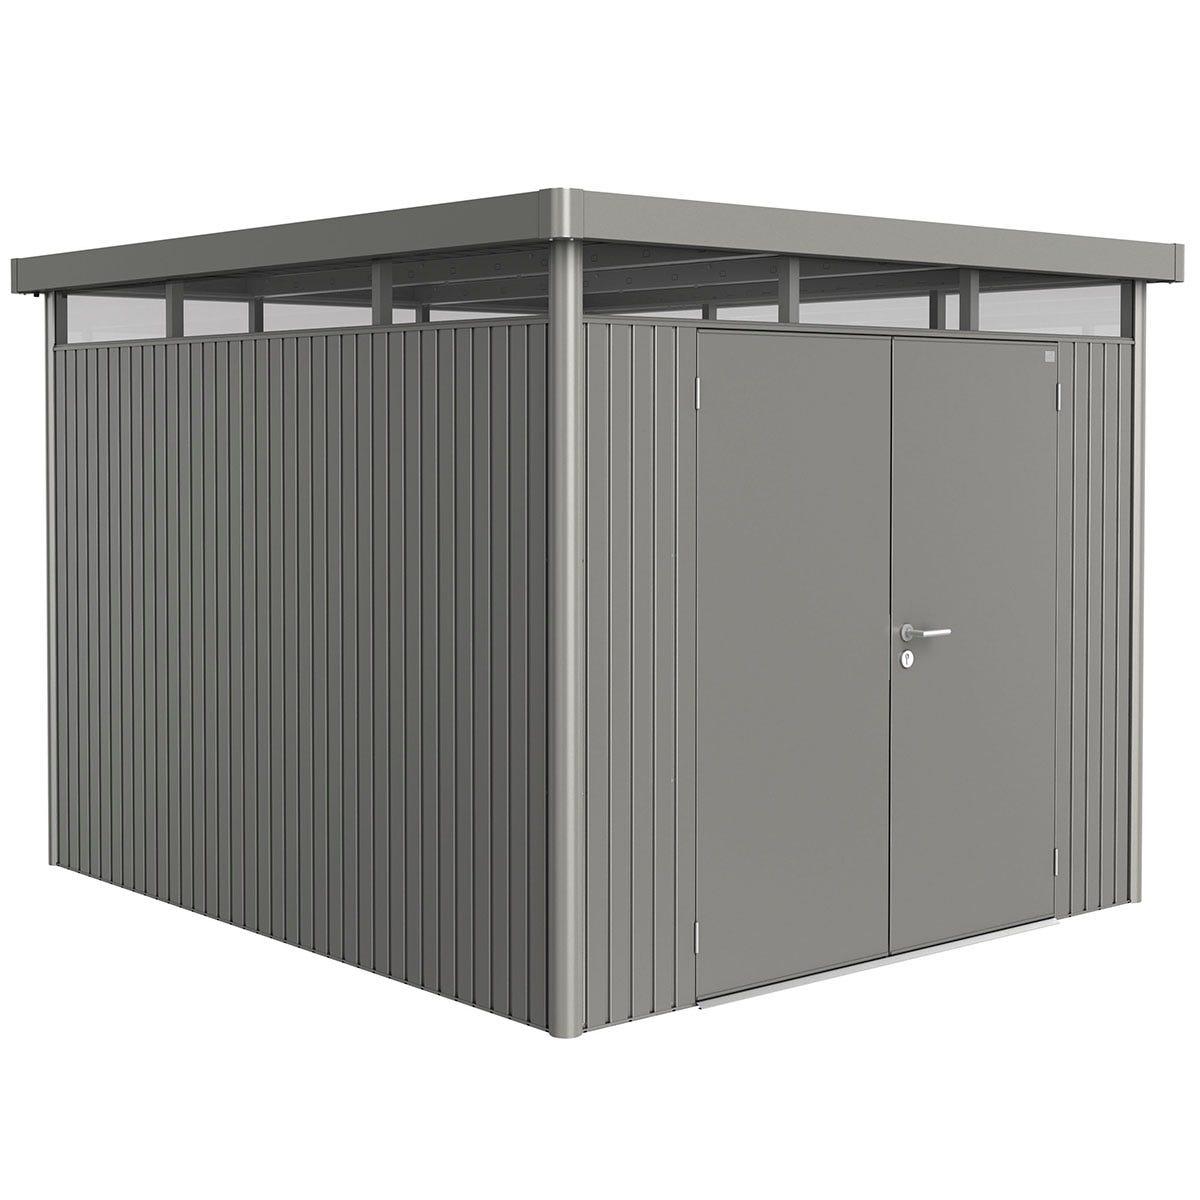 Biohort Highline Metal Shed H5 Double door 9 x 10 - Quartz Grey